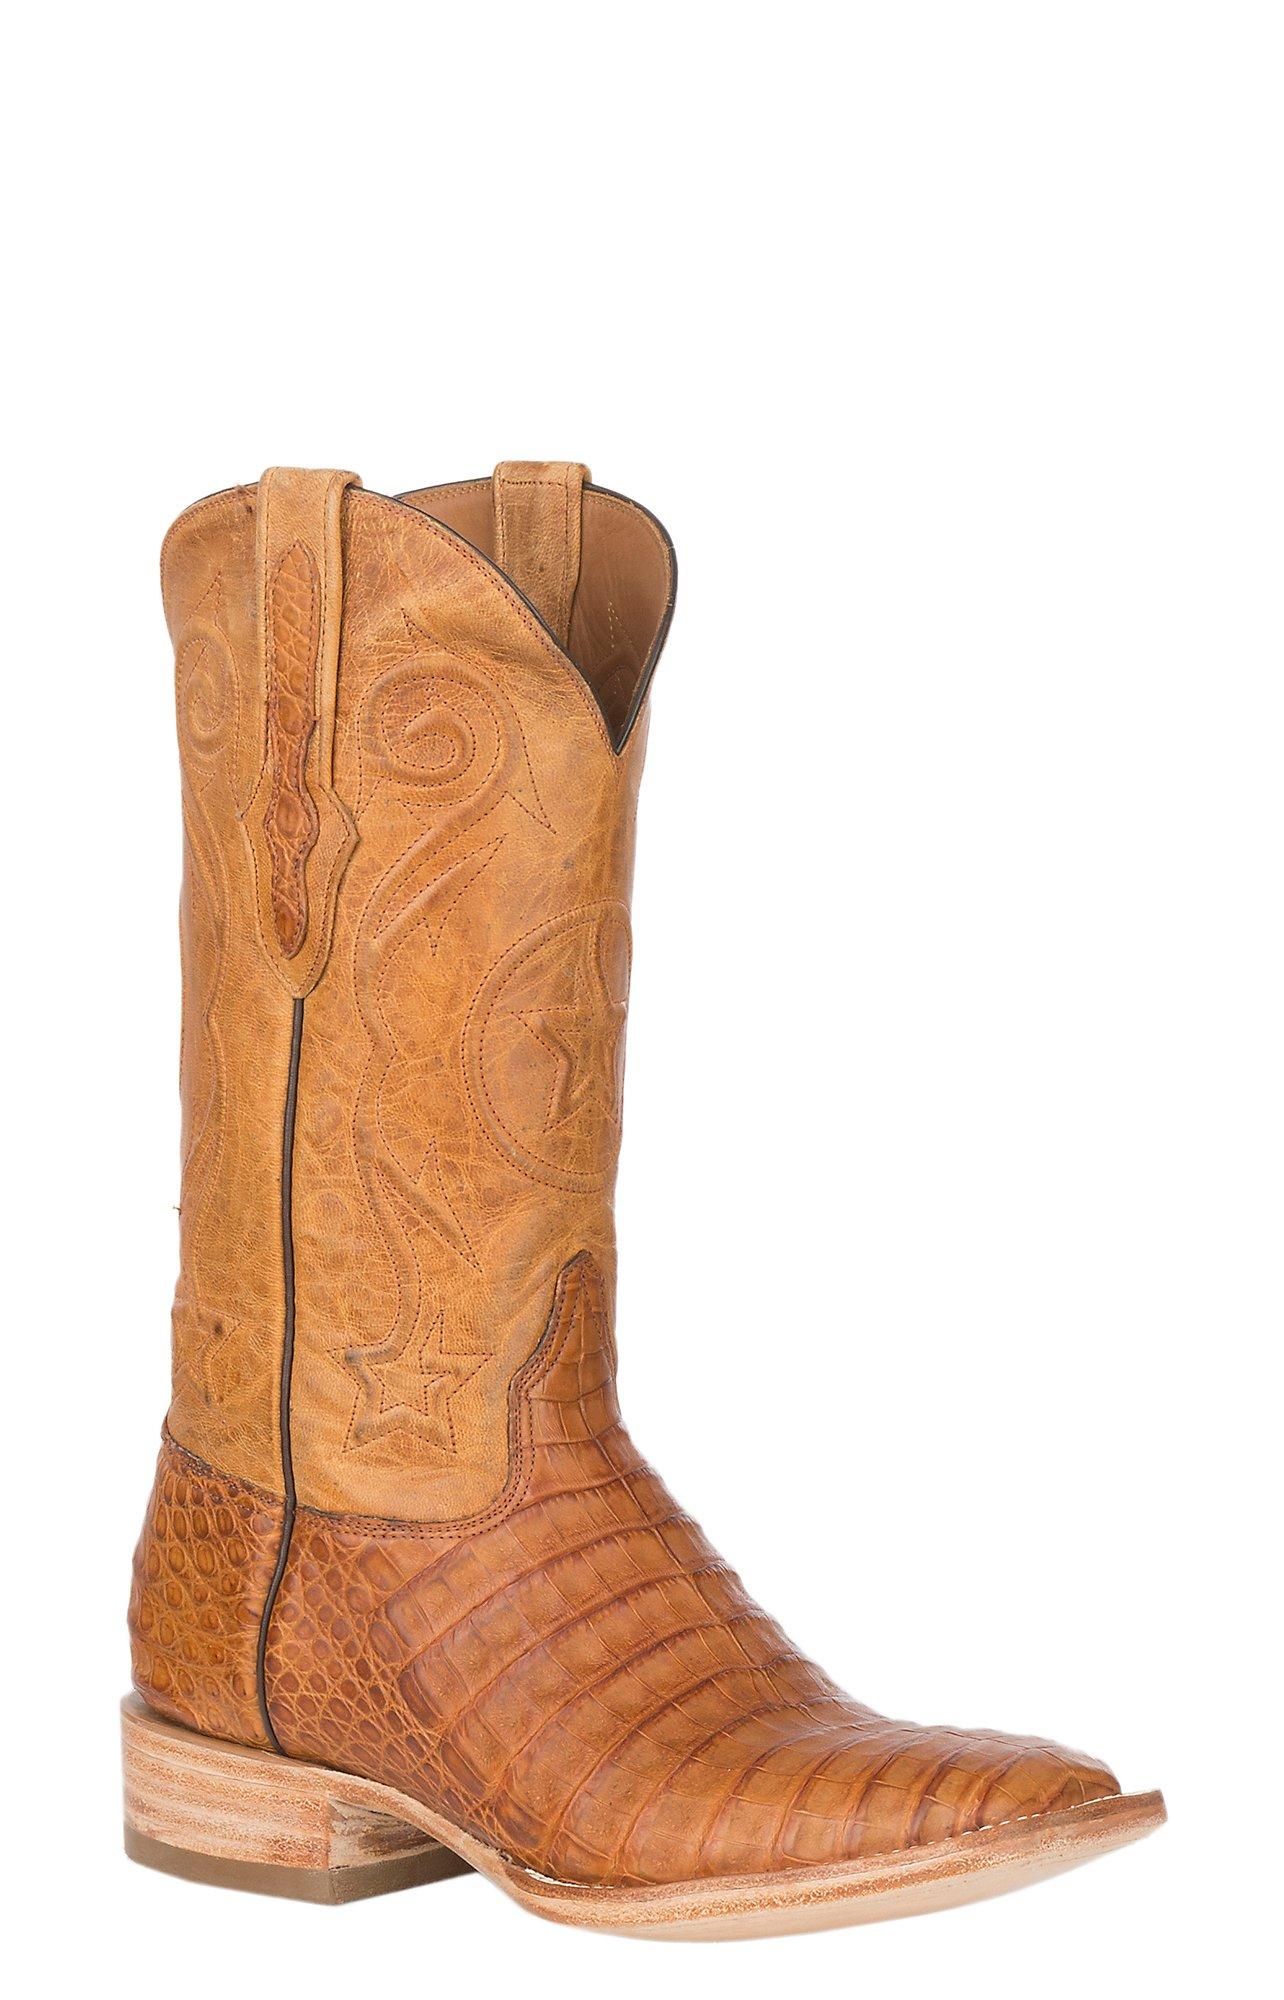 Black Jack Men's Cognac Maddog Caiman Belly Exotic Wide Square Toe Boots